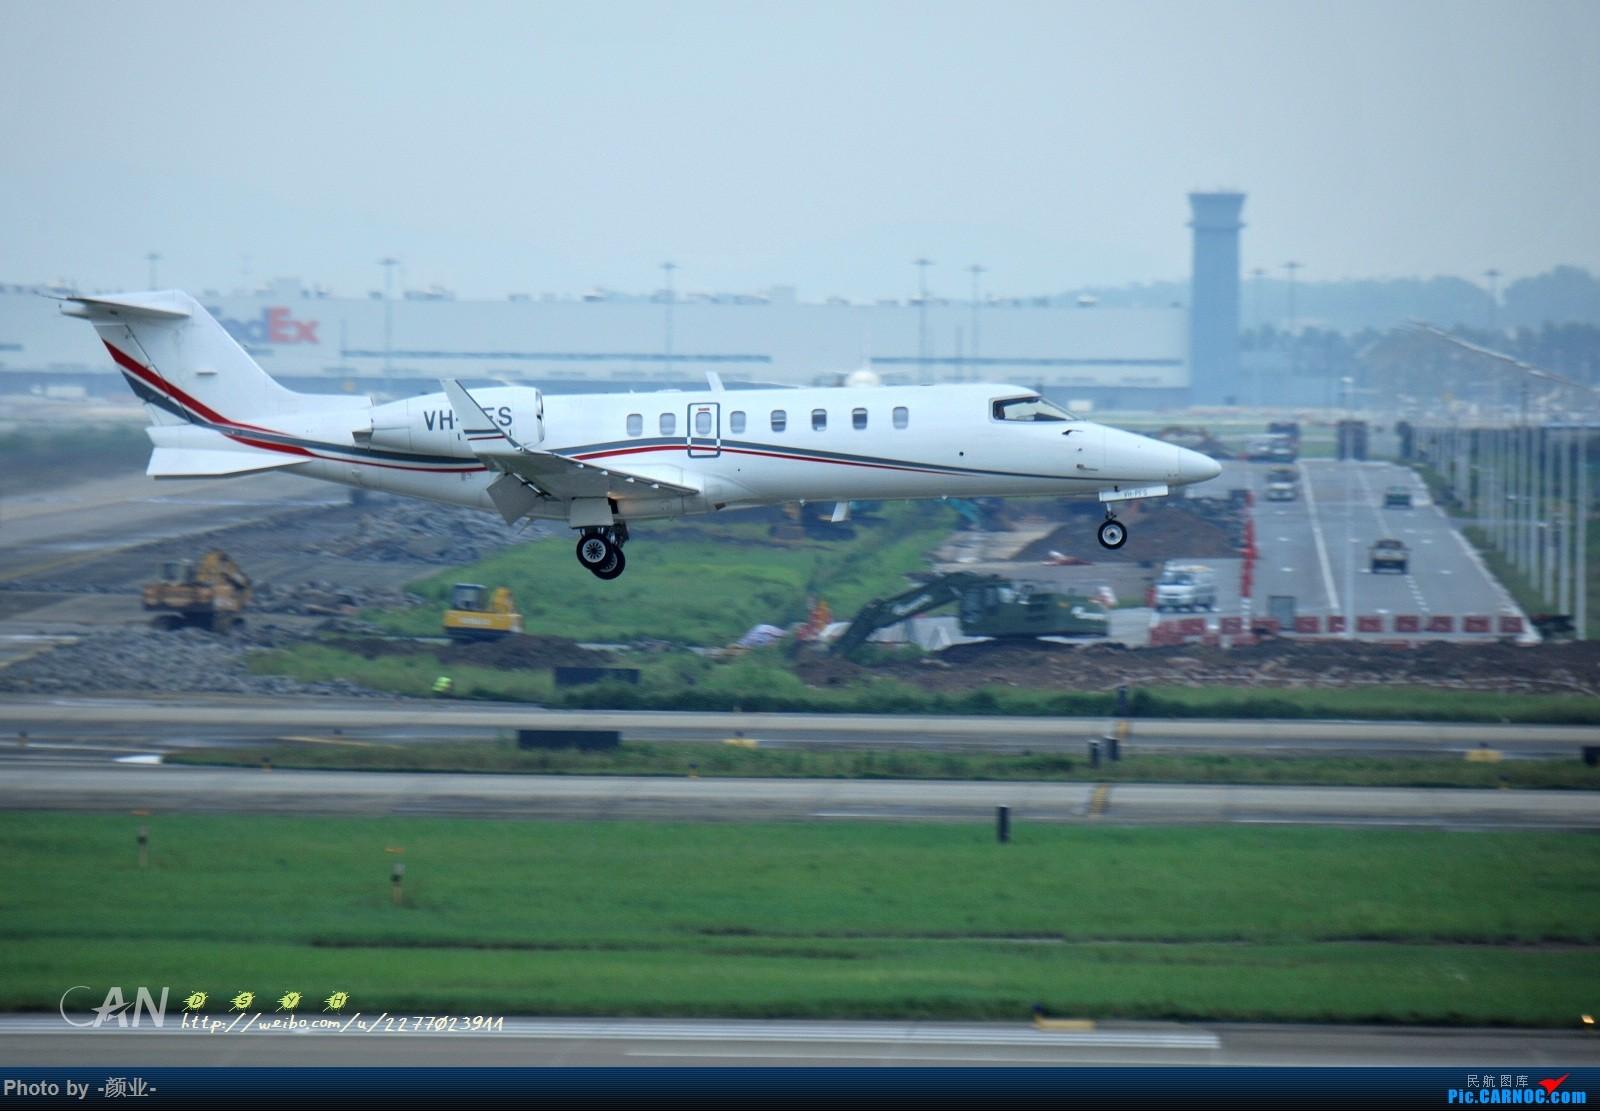 Re:[原创]2011-2016我的打灰机心情[广州] BOMBARDIER LEARJET VH-PFS 中国广州白云国际机场